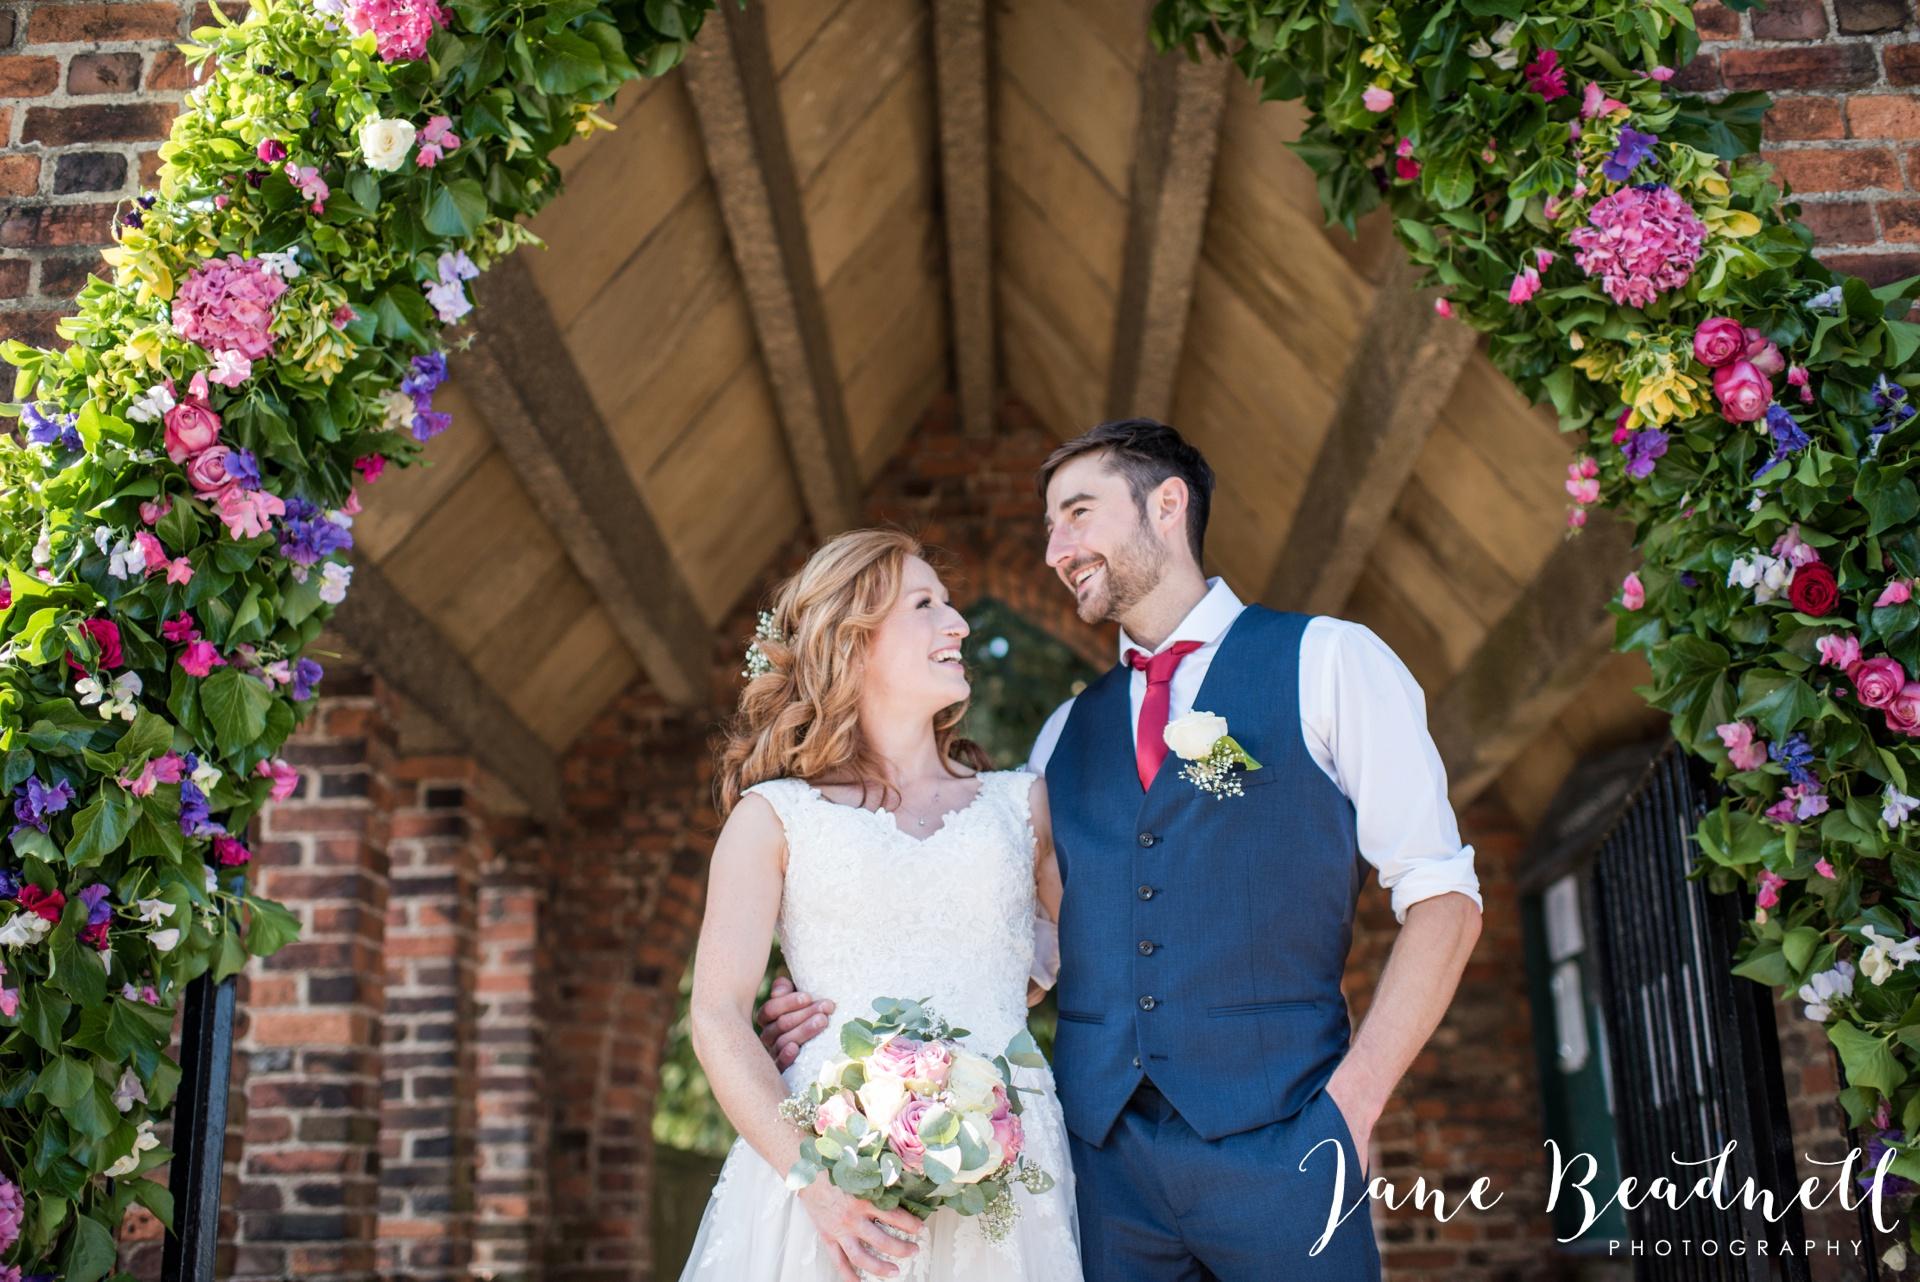 yorkshire-fine-art-wedding-photographer-jane-beadnell-photography-poppleton-york_0119